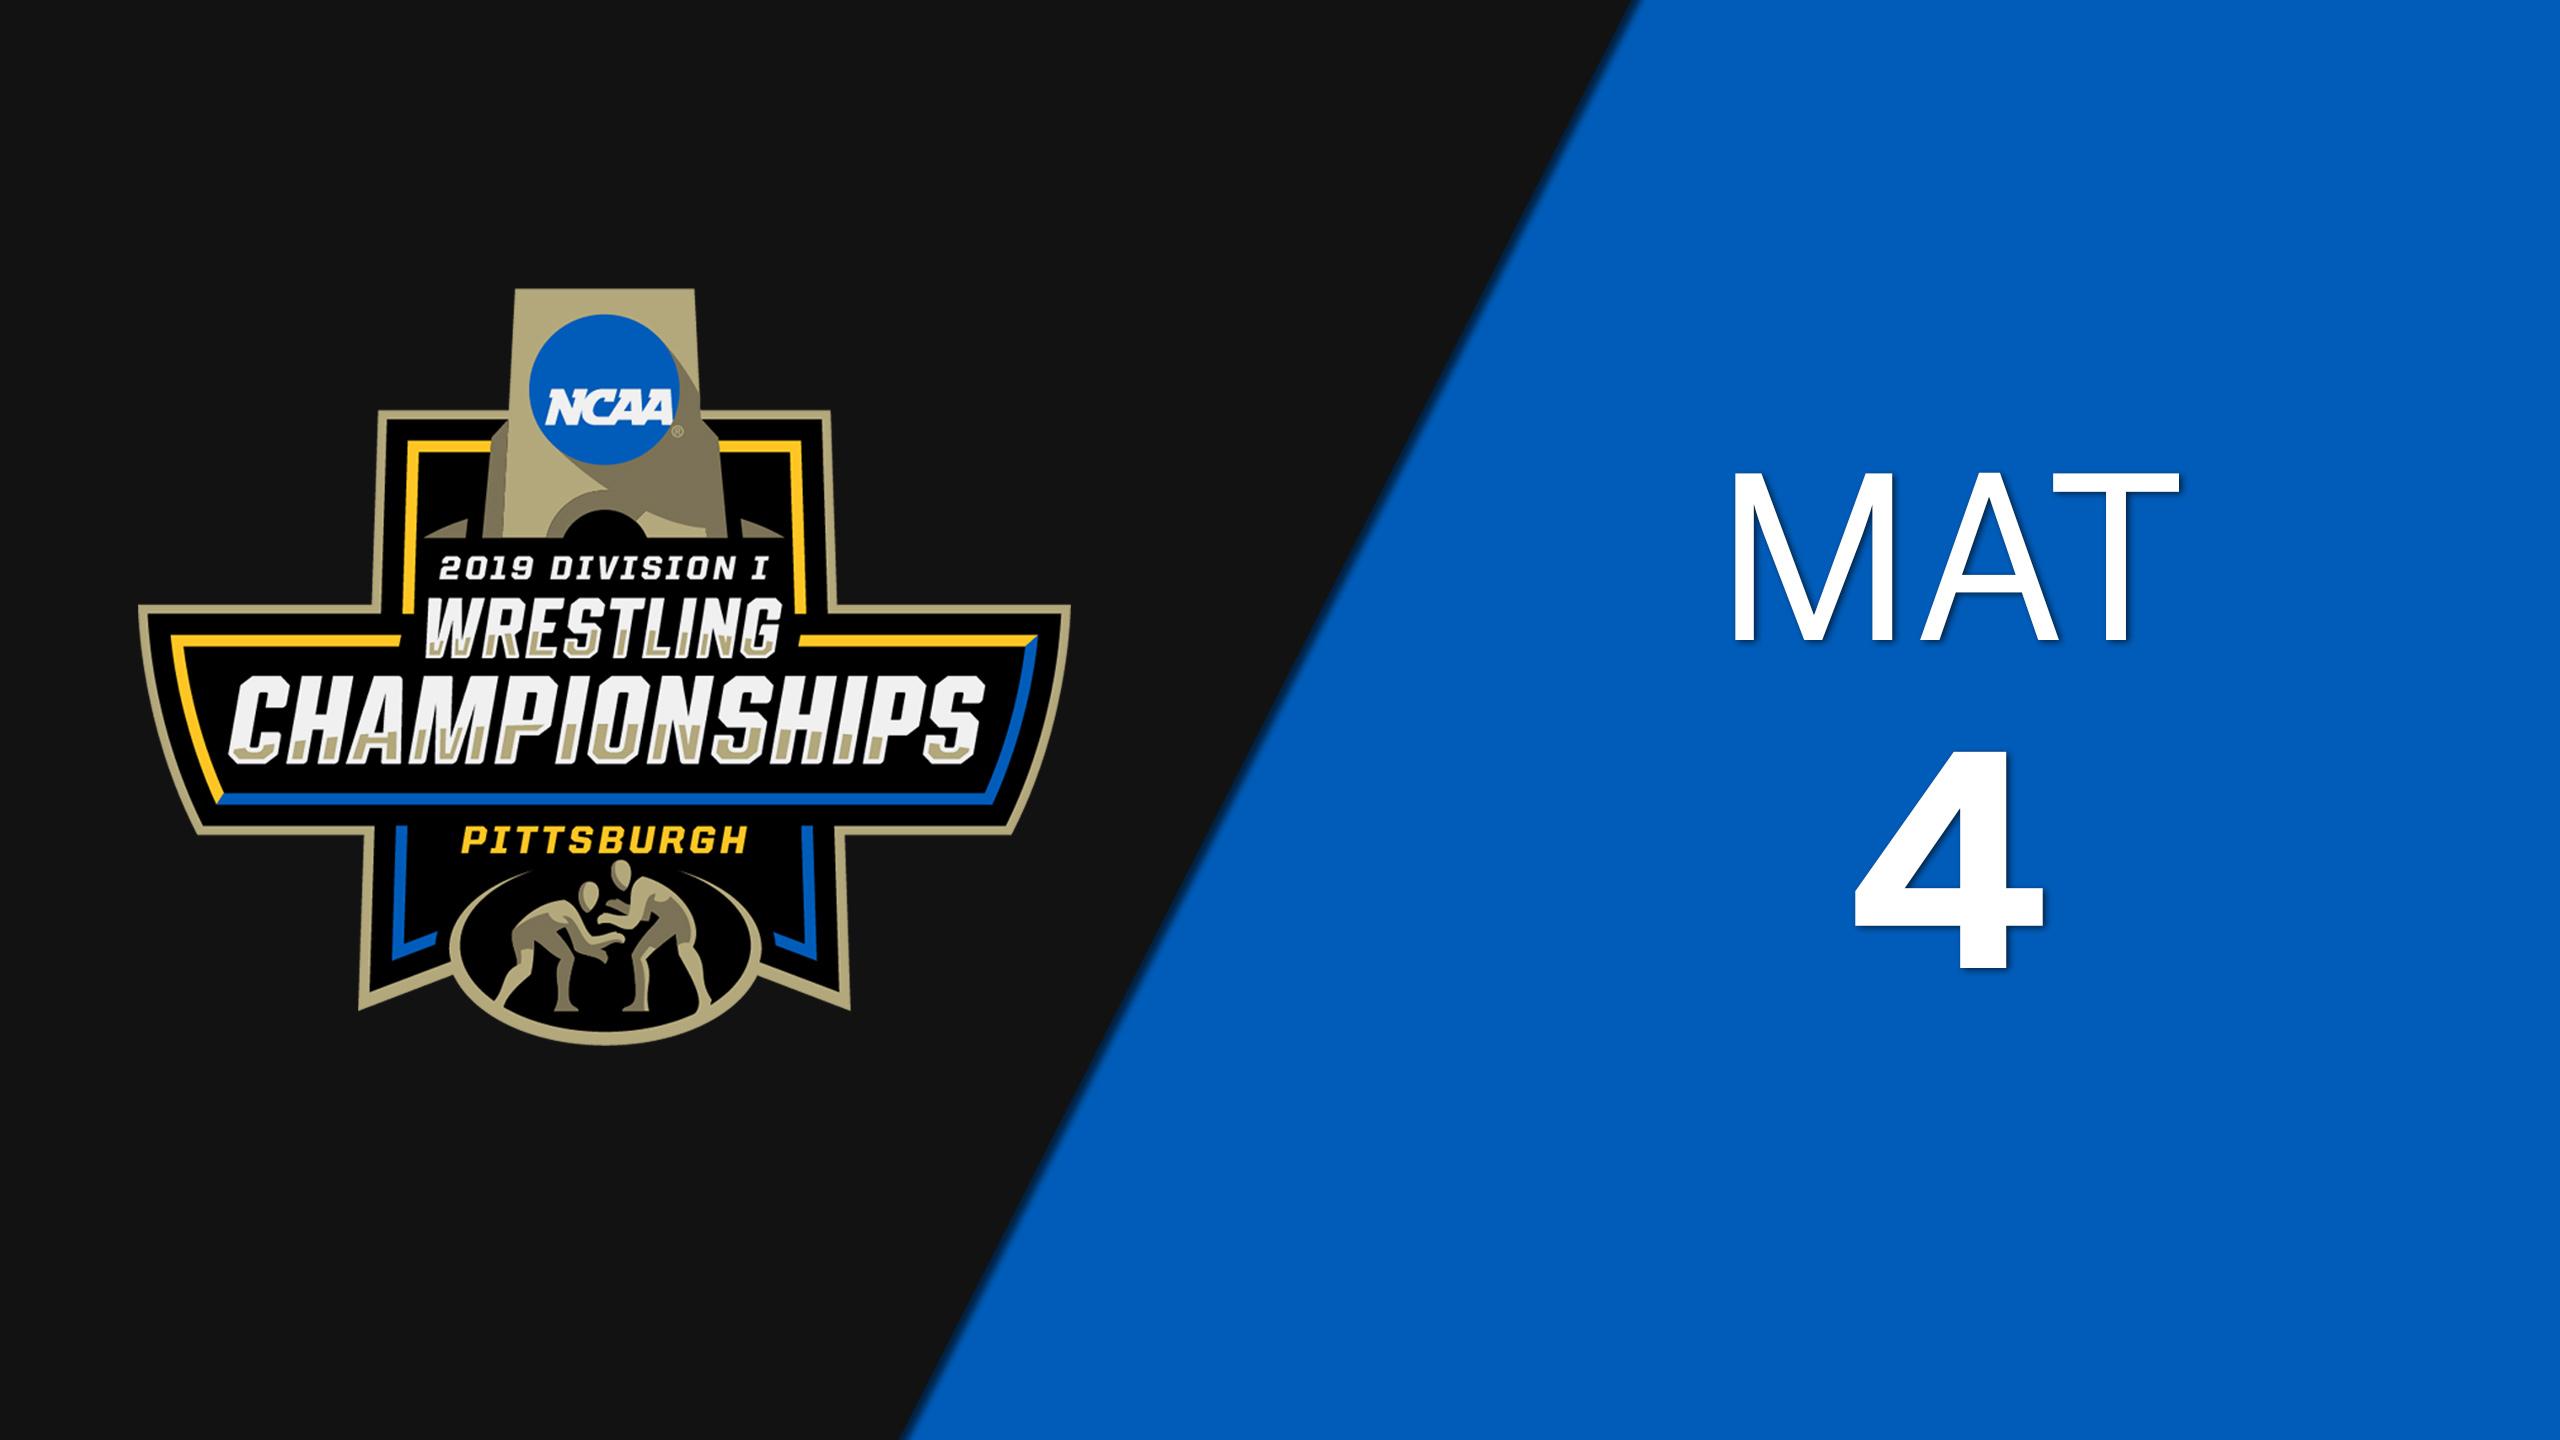 NCAA Wrestling Championship (Mat 4, First Round)